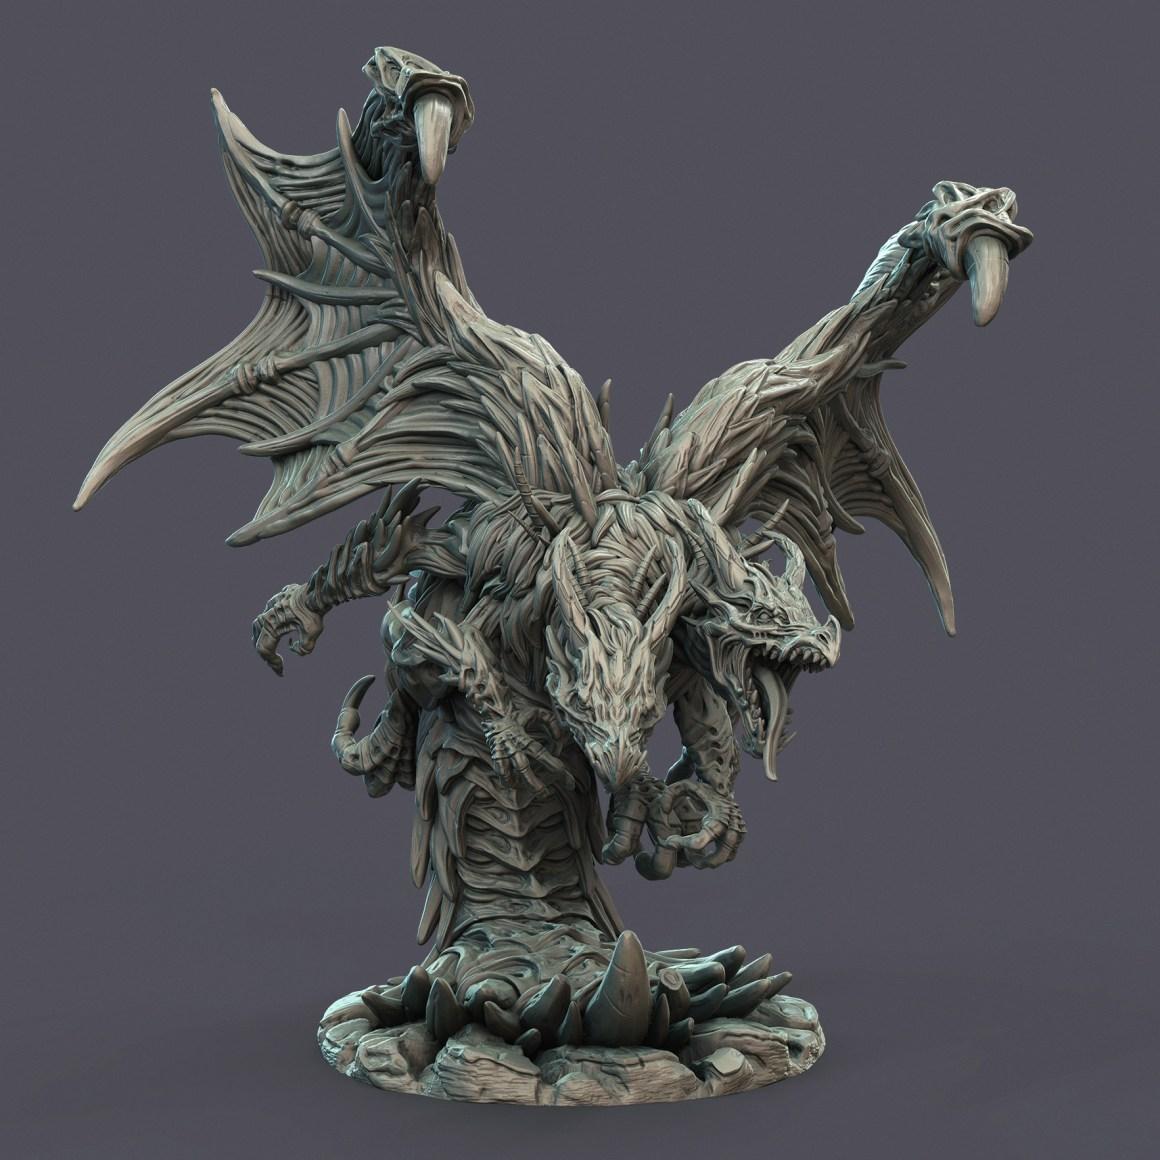 Twin Dragon - Wild Assent by Gustavo Zampieri